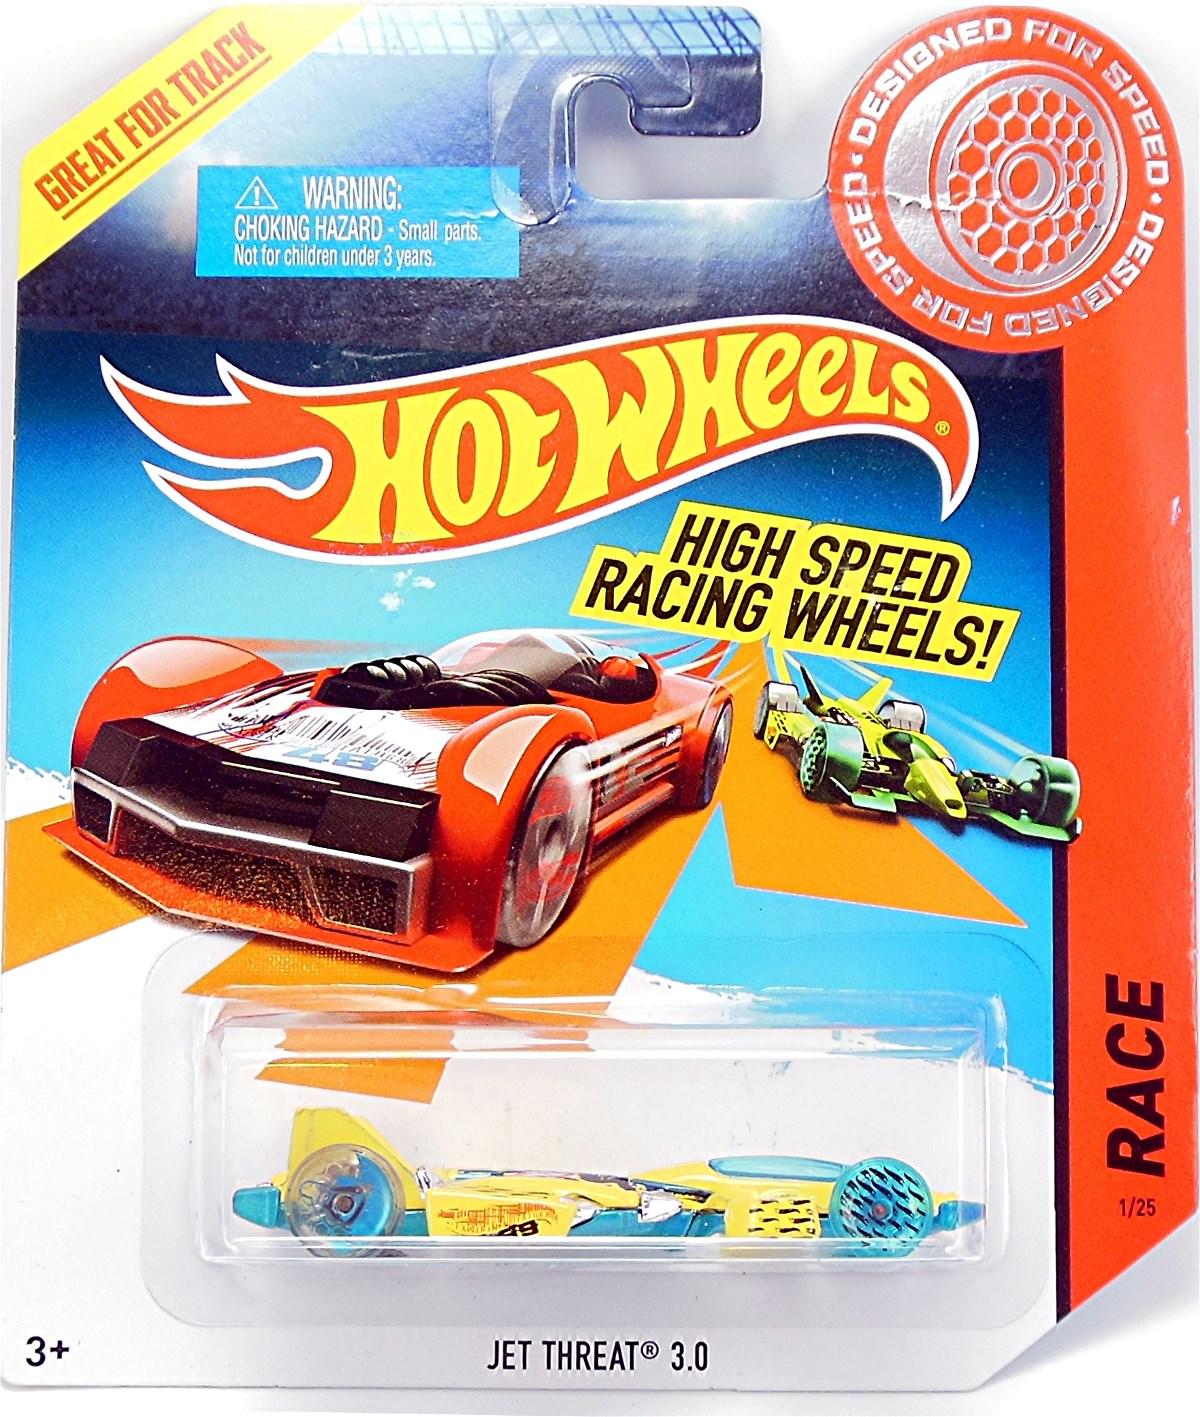 Hot Wheels High Speed Racing Wheels 2014 Hot Wheels High Speed